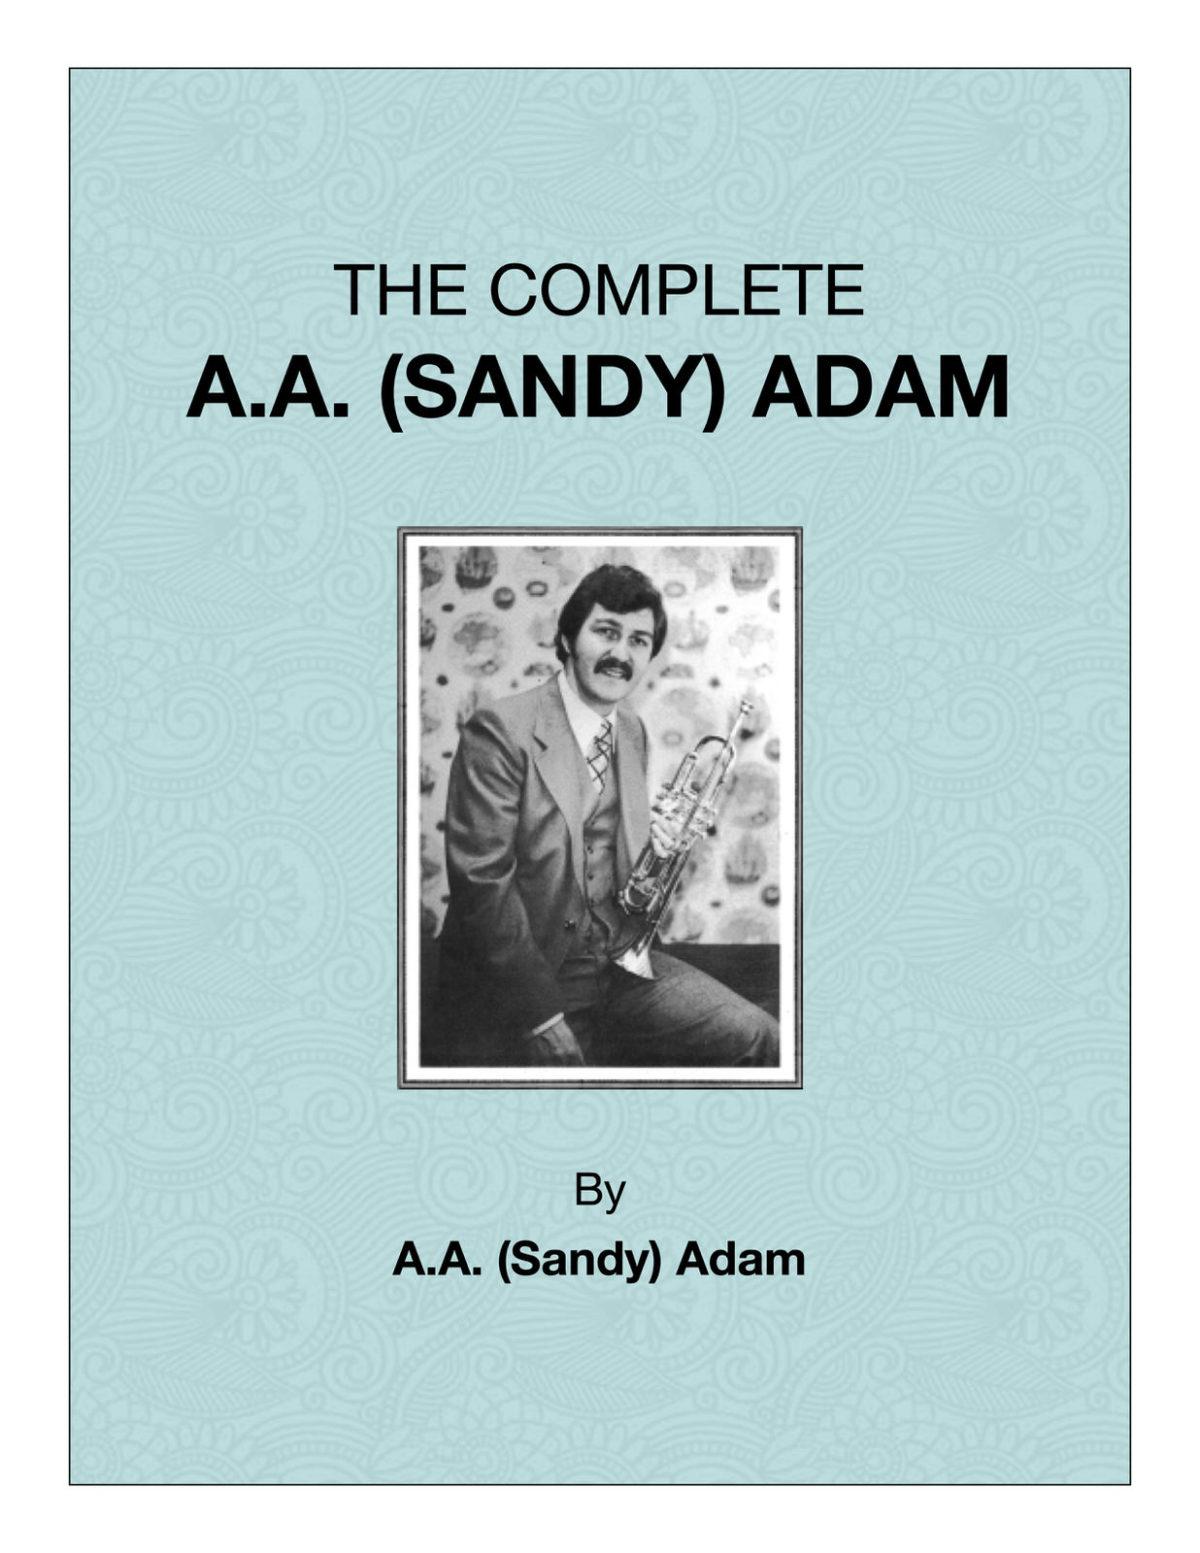 Complete Sandy Adam Cover